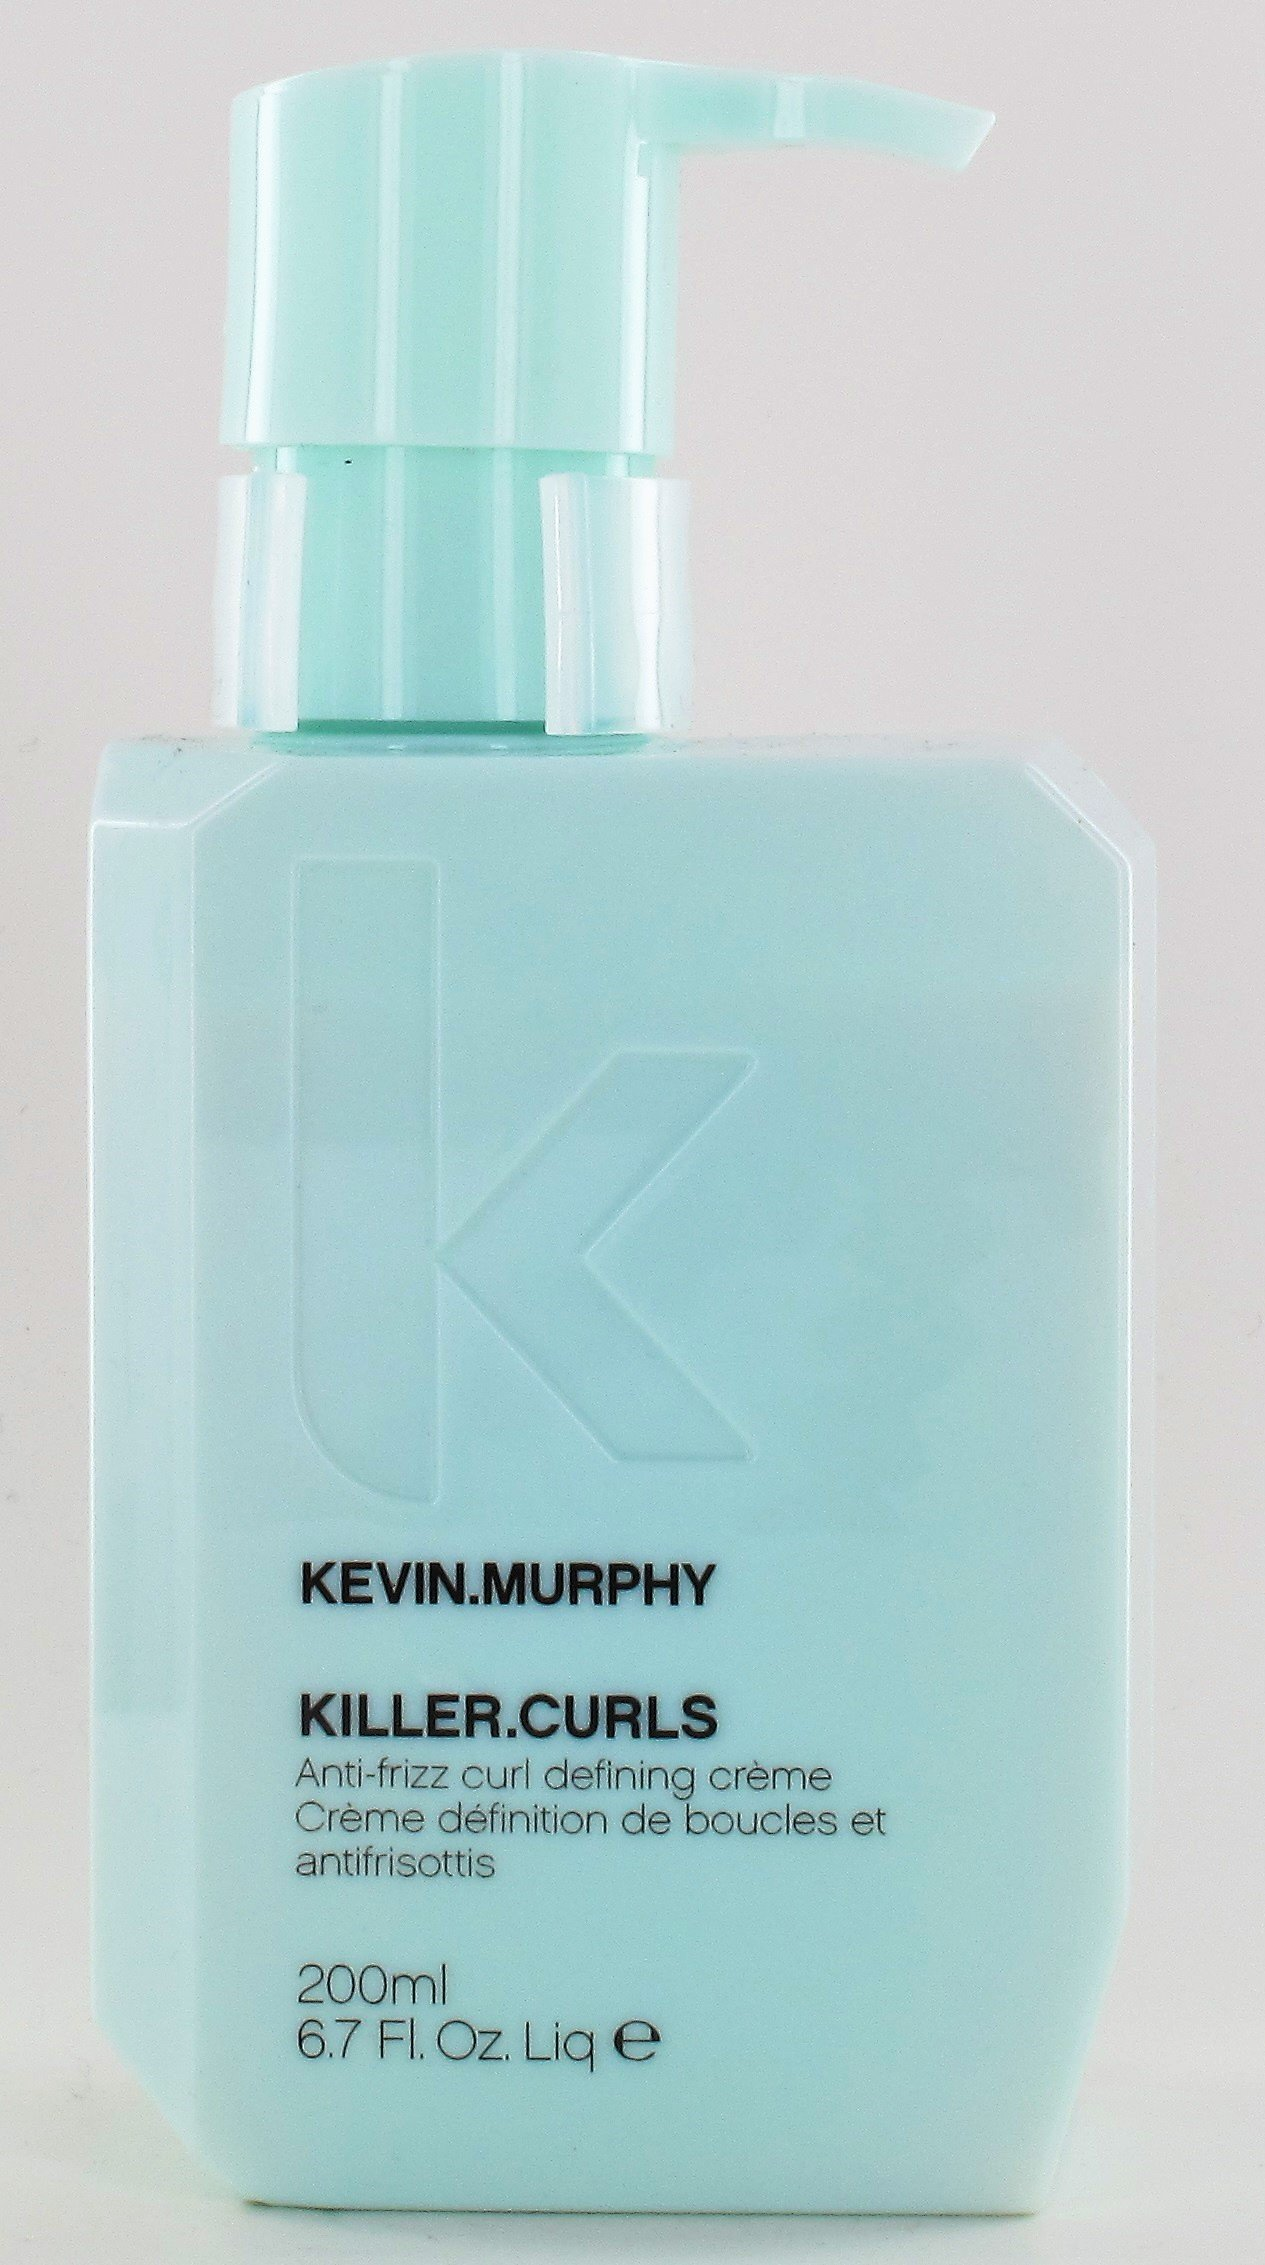 Kevin Murphy Killer Curls 6.7oz